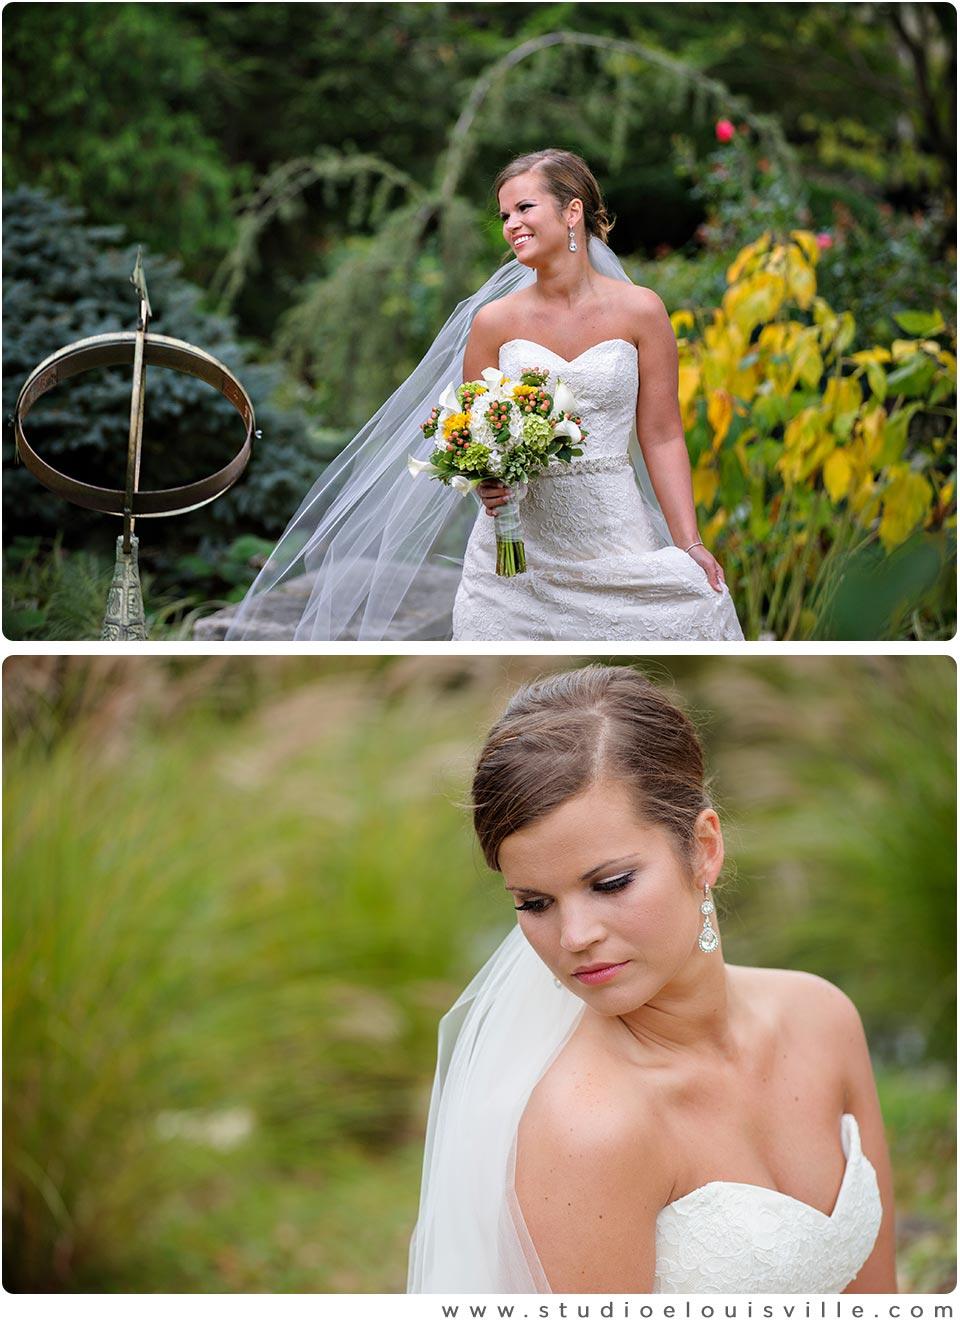 Hannah deangelo wedding